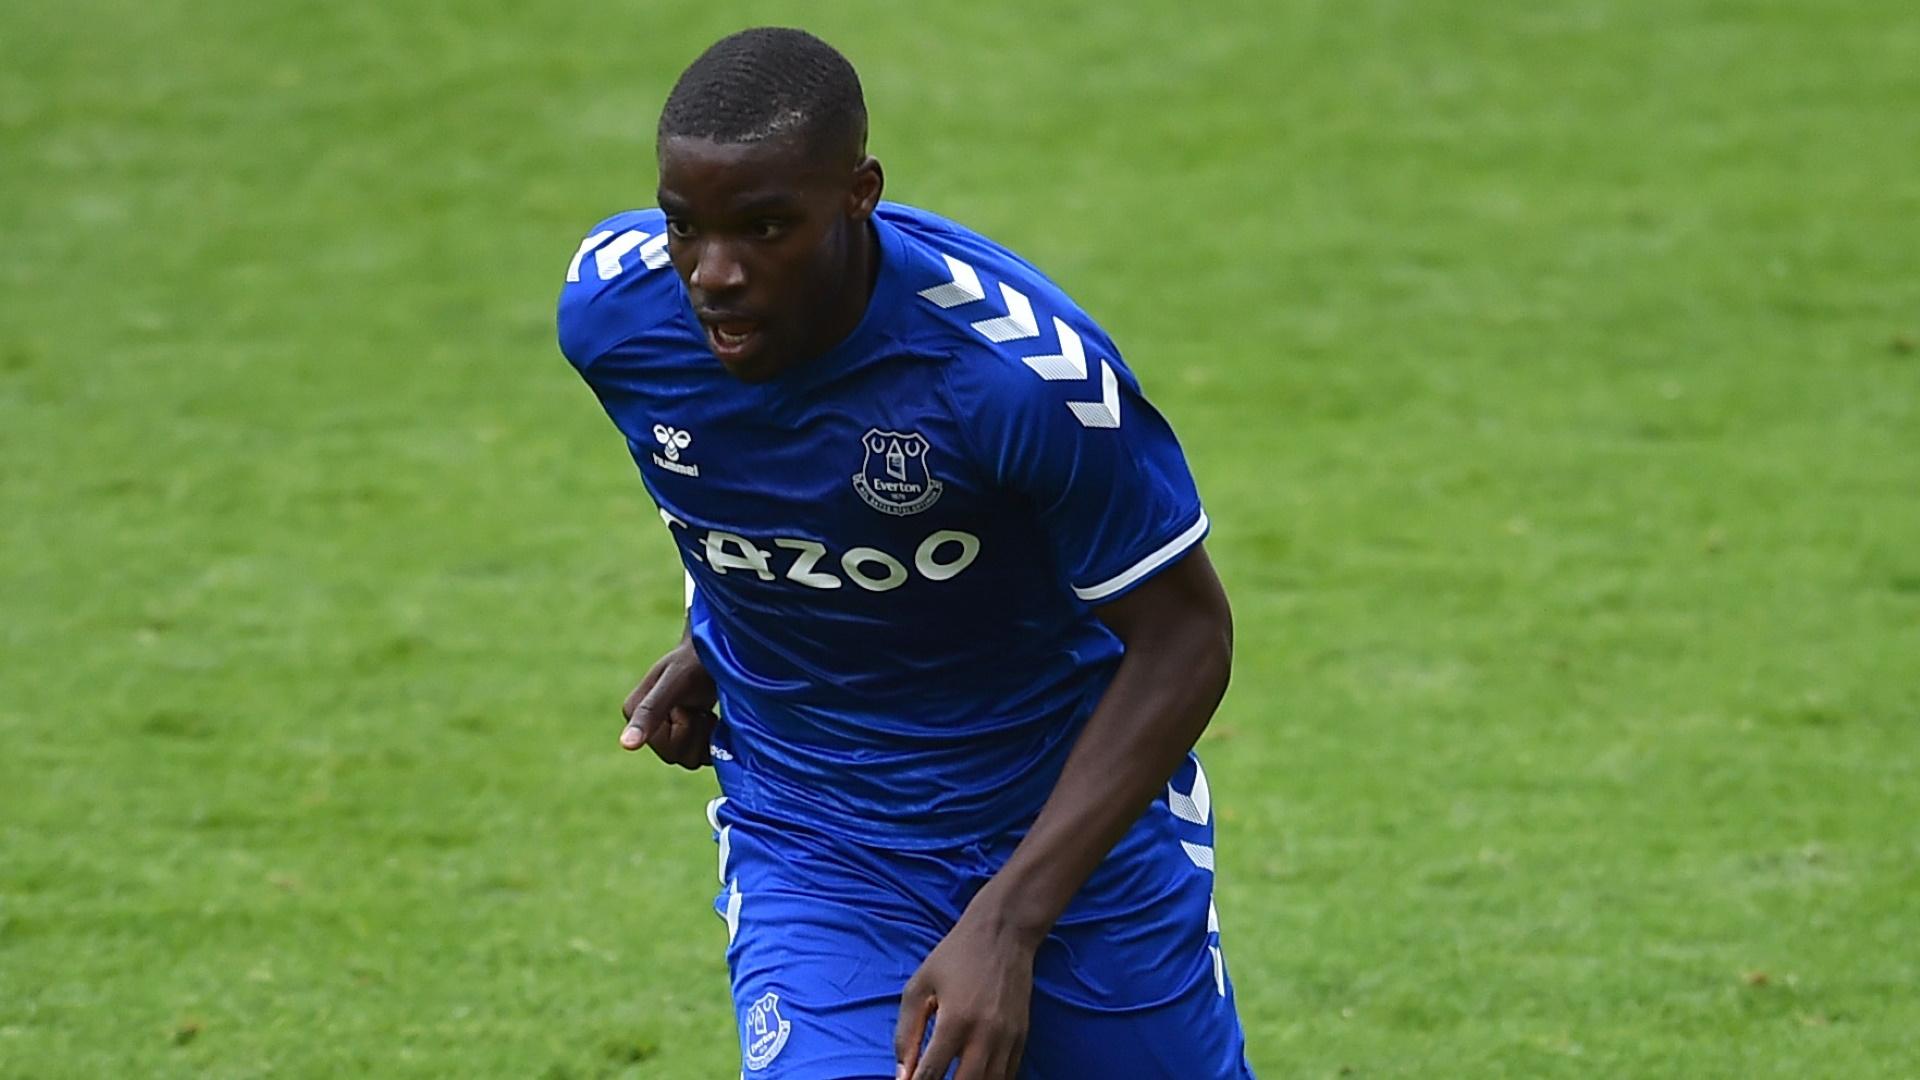 Calvert-Lewin & Saka earn England call-ups as Foden & Greenwood are overlooked